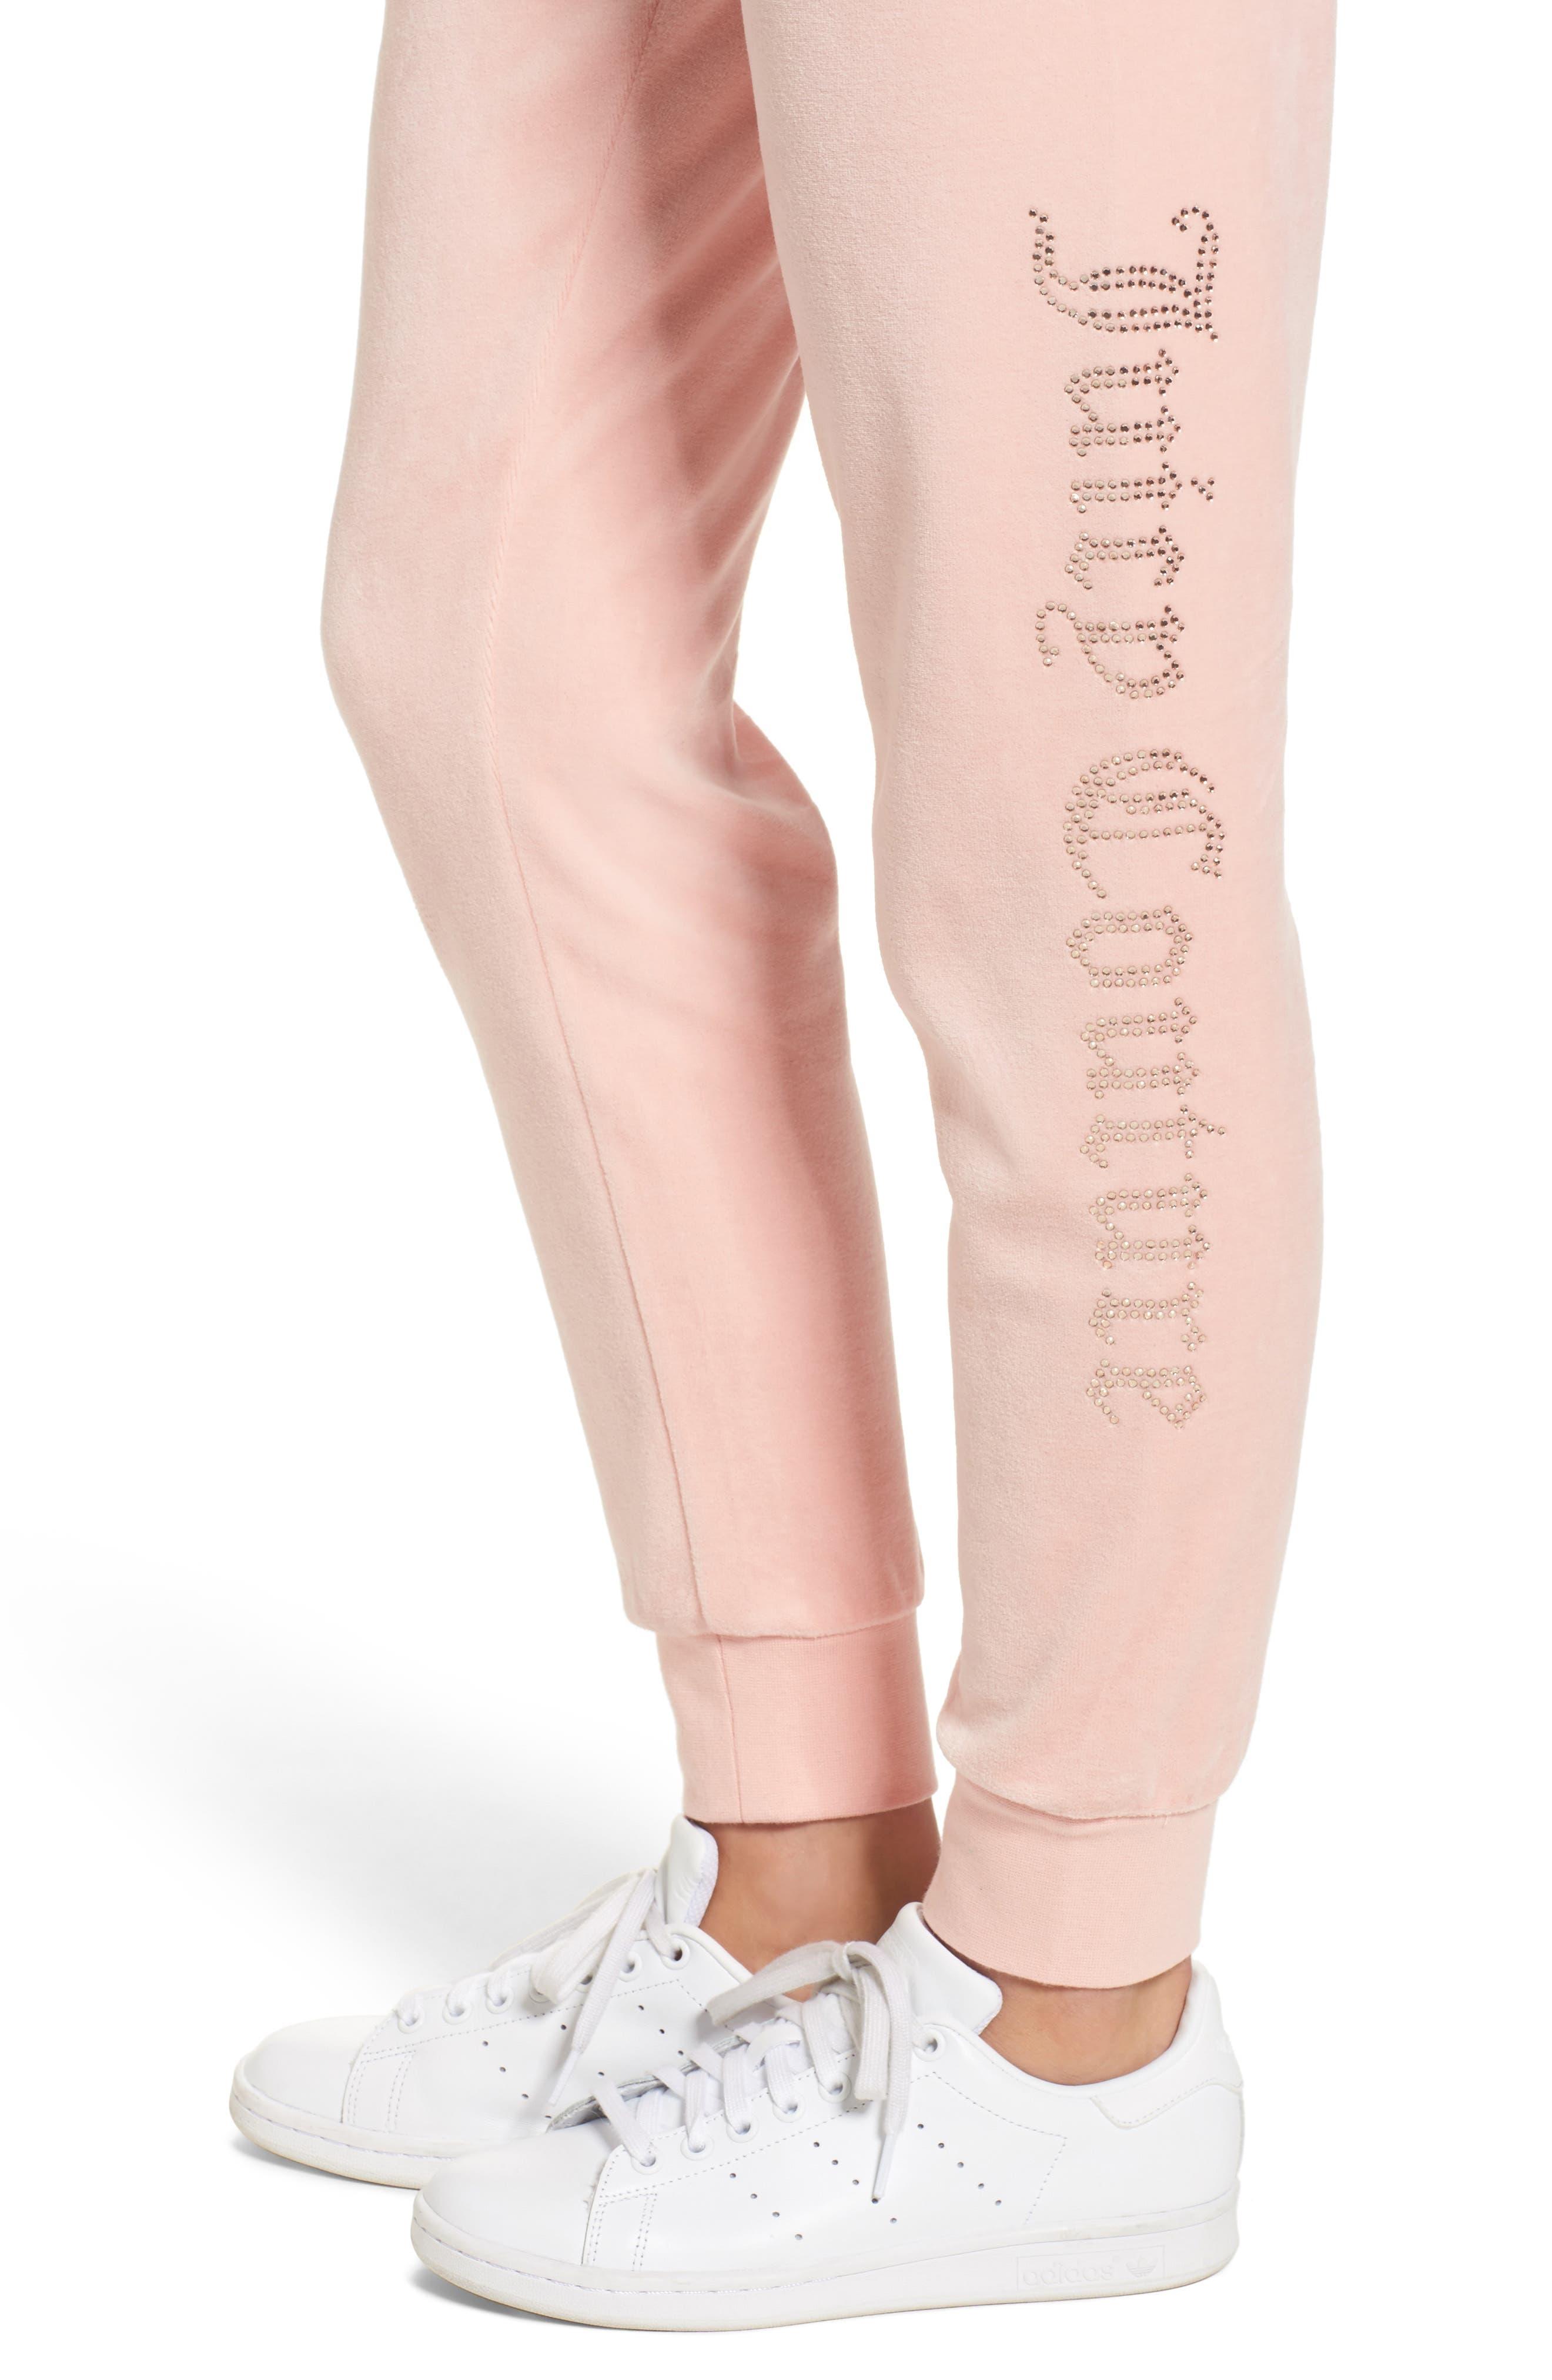 Zuma Crystal Velour Pants,                             Alternate thumbnail 4, color,                             Sugared Icing